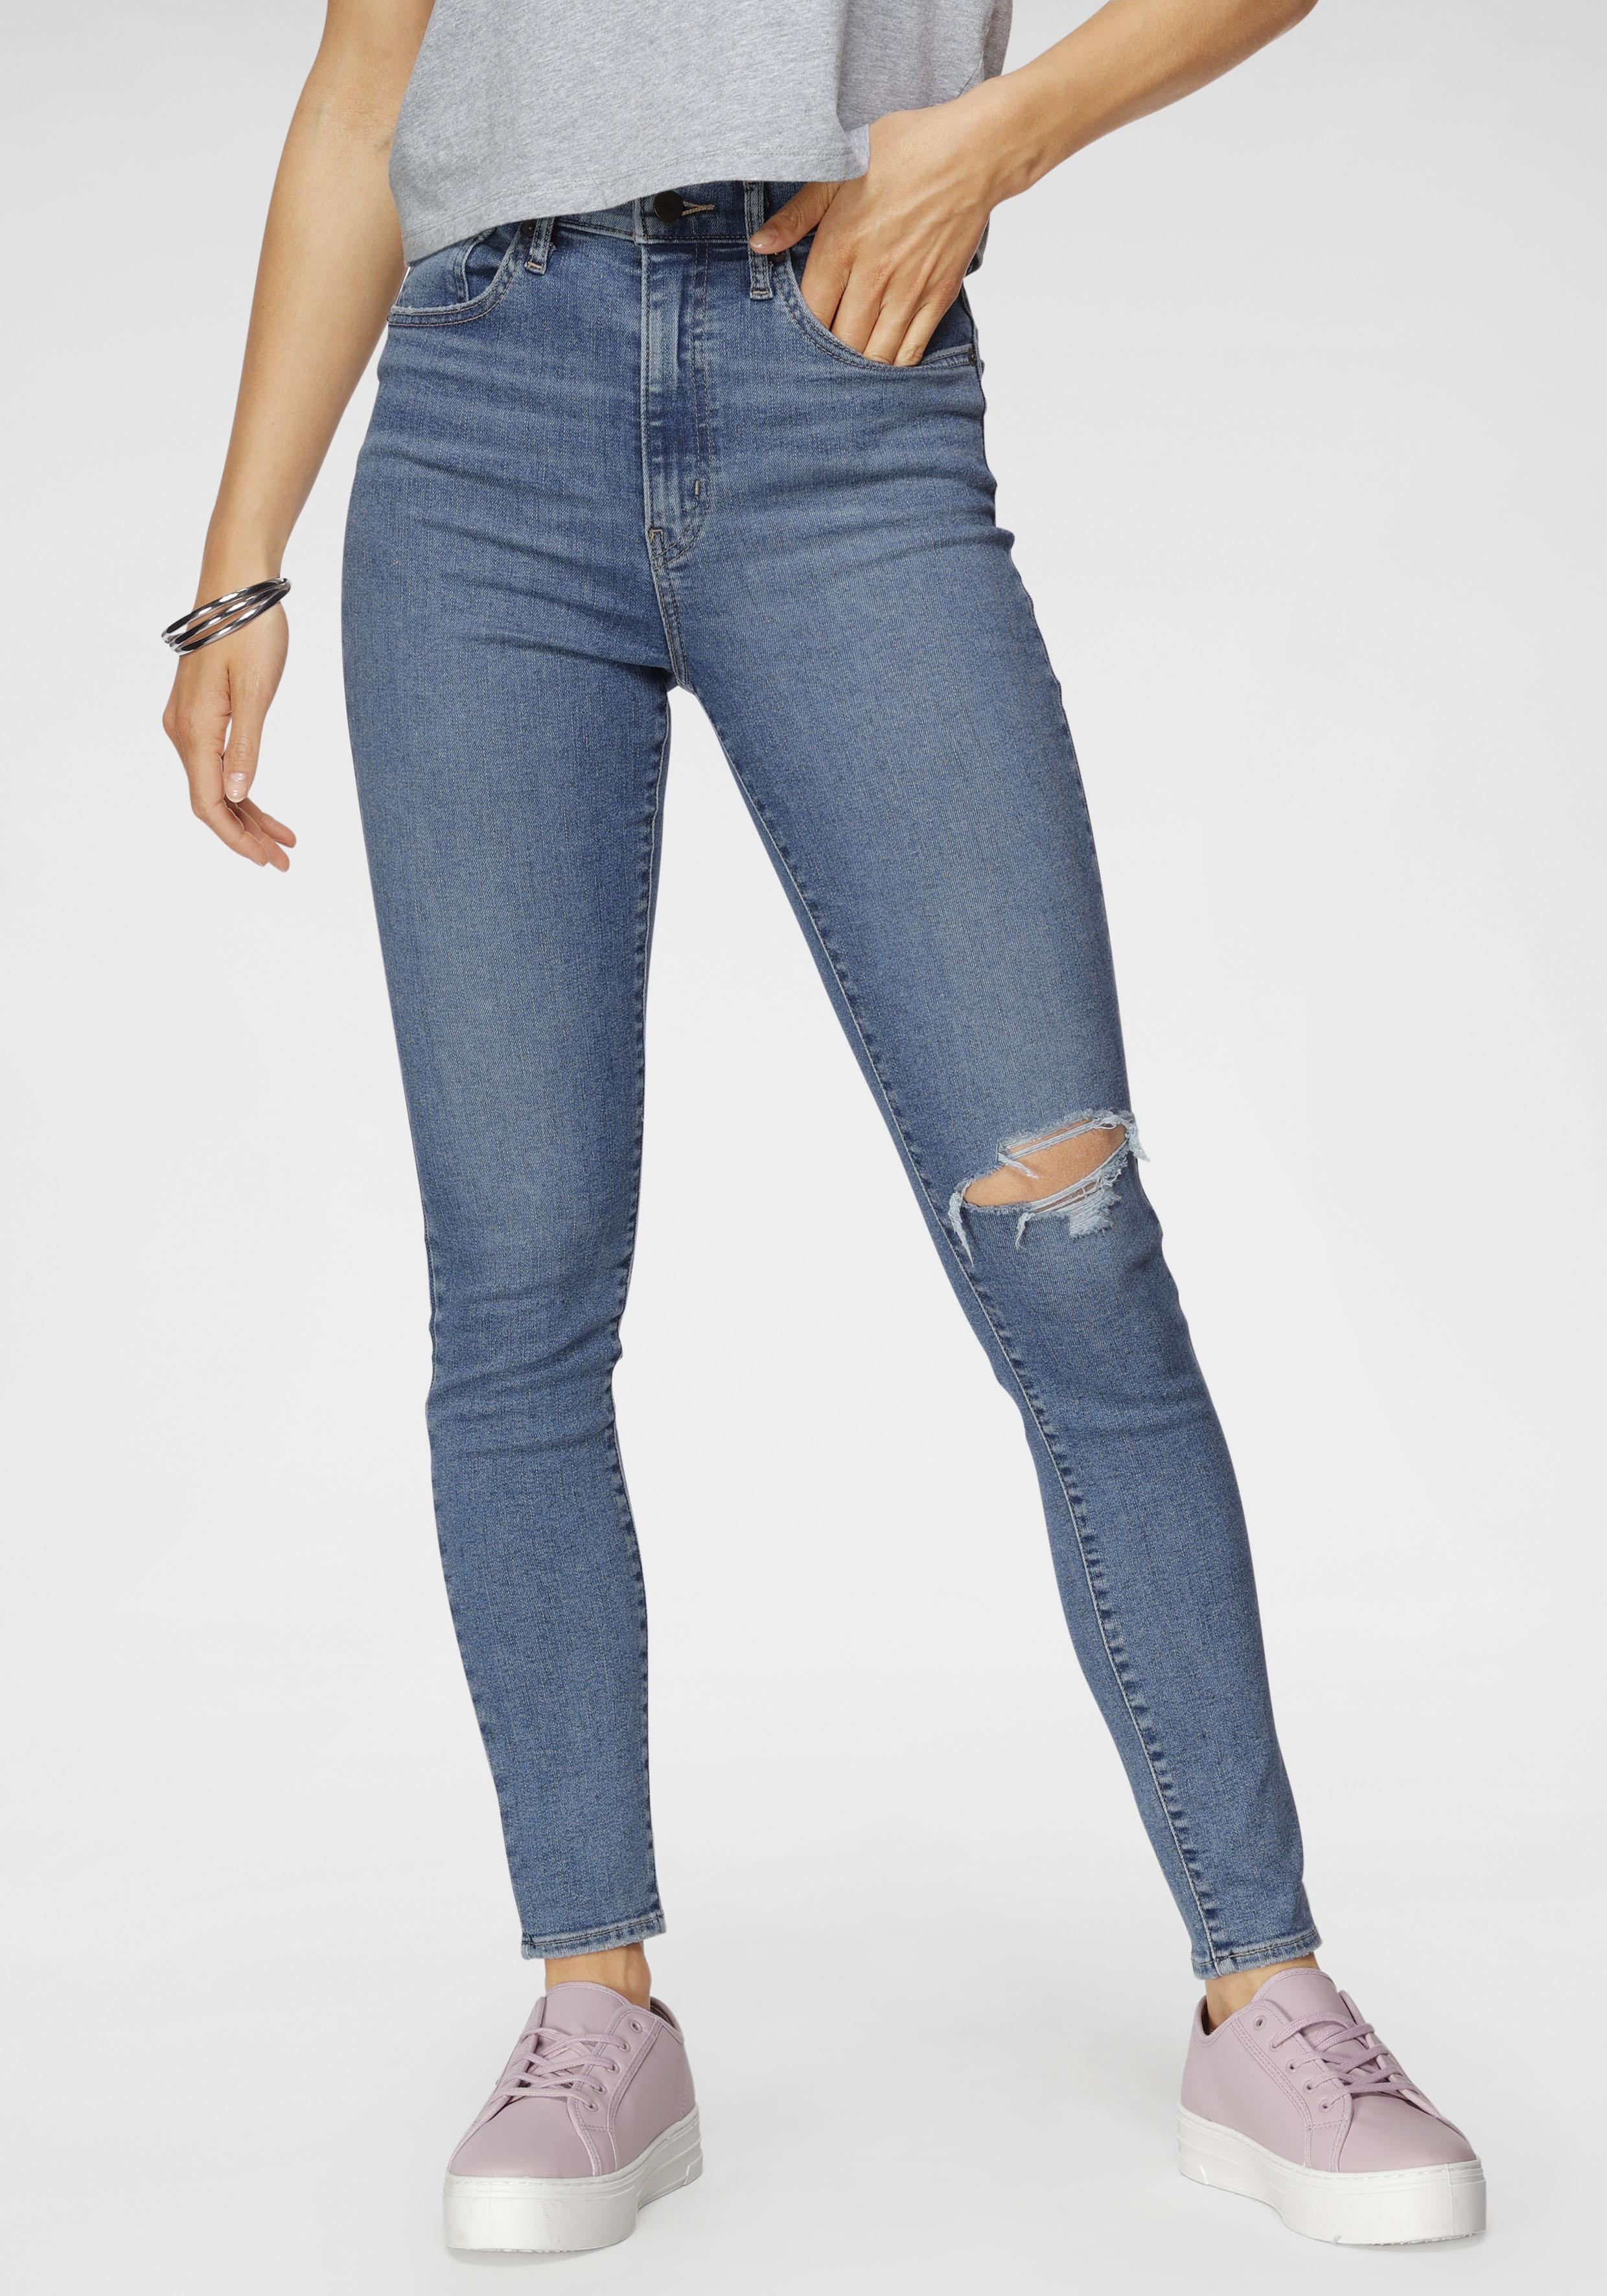 levis - Levi's Skinny-fit-Jeans MILE HIGH SUPER SKINNY